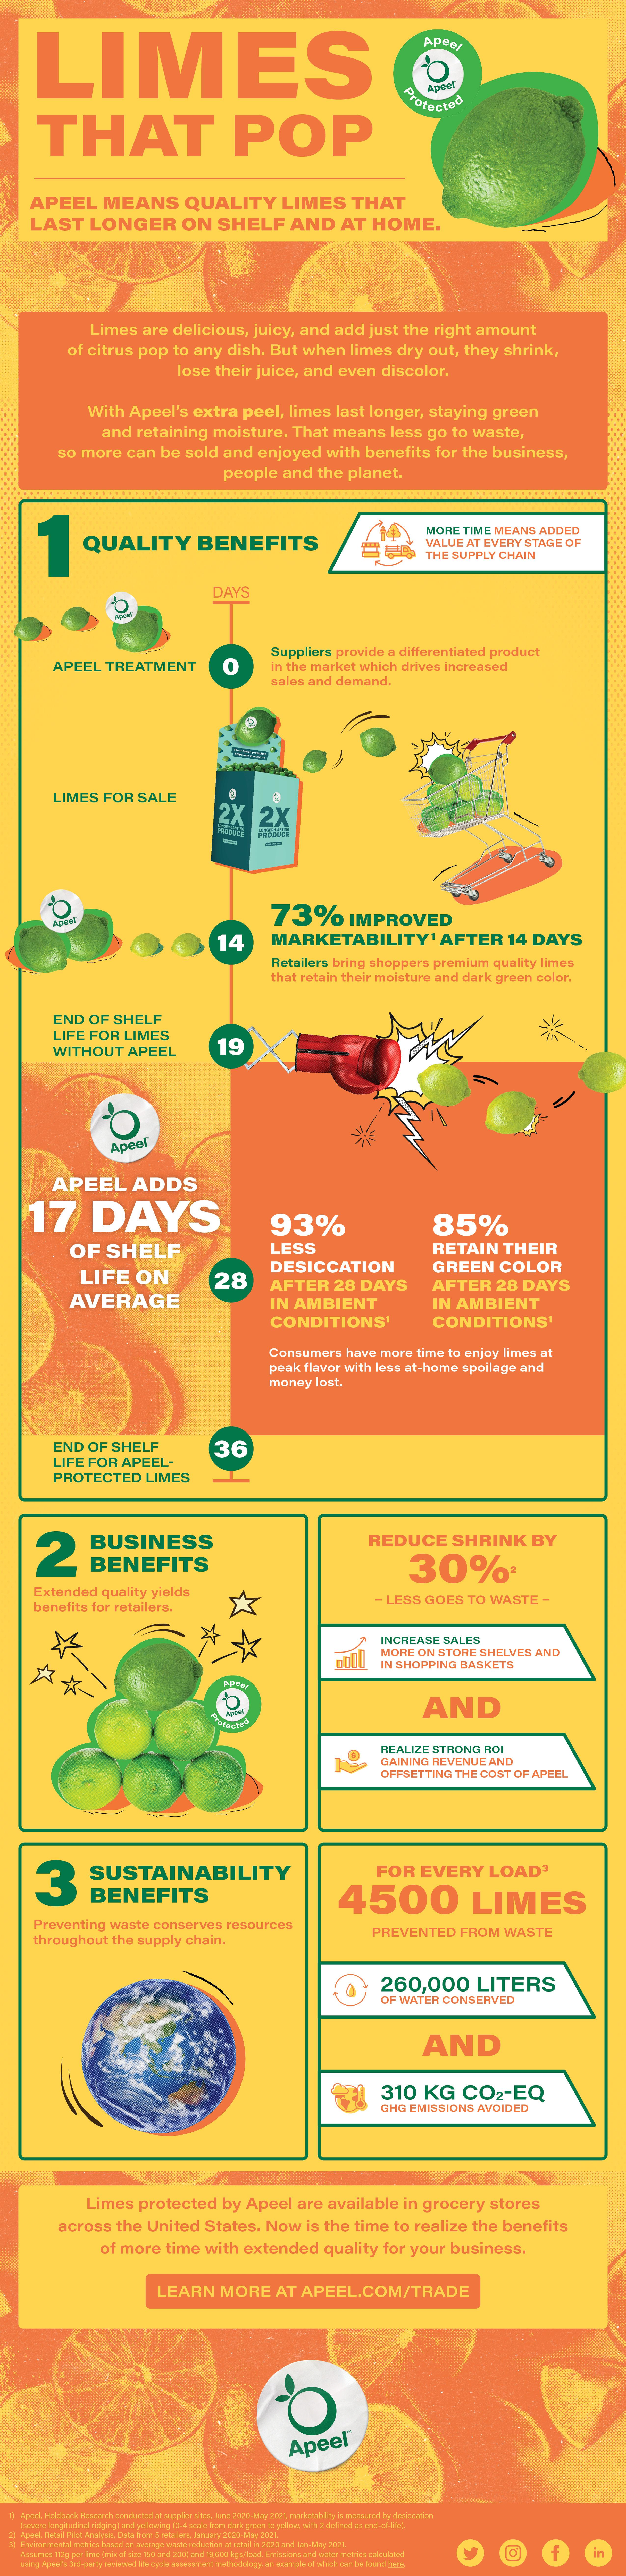 Apeel-Limes-Infographic-JUL2021-FINAL